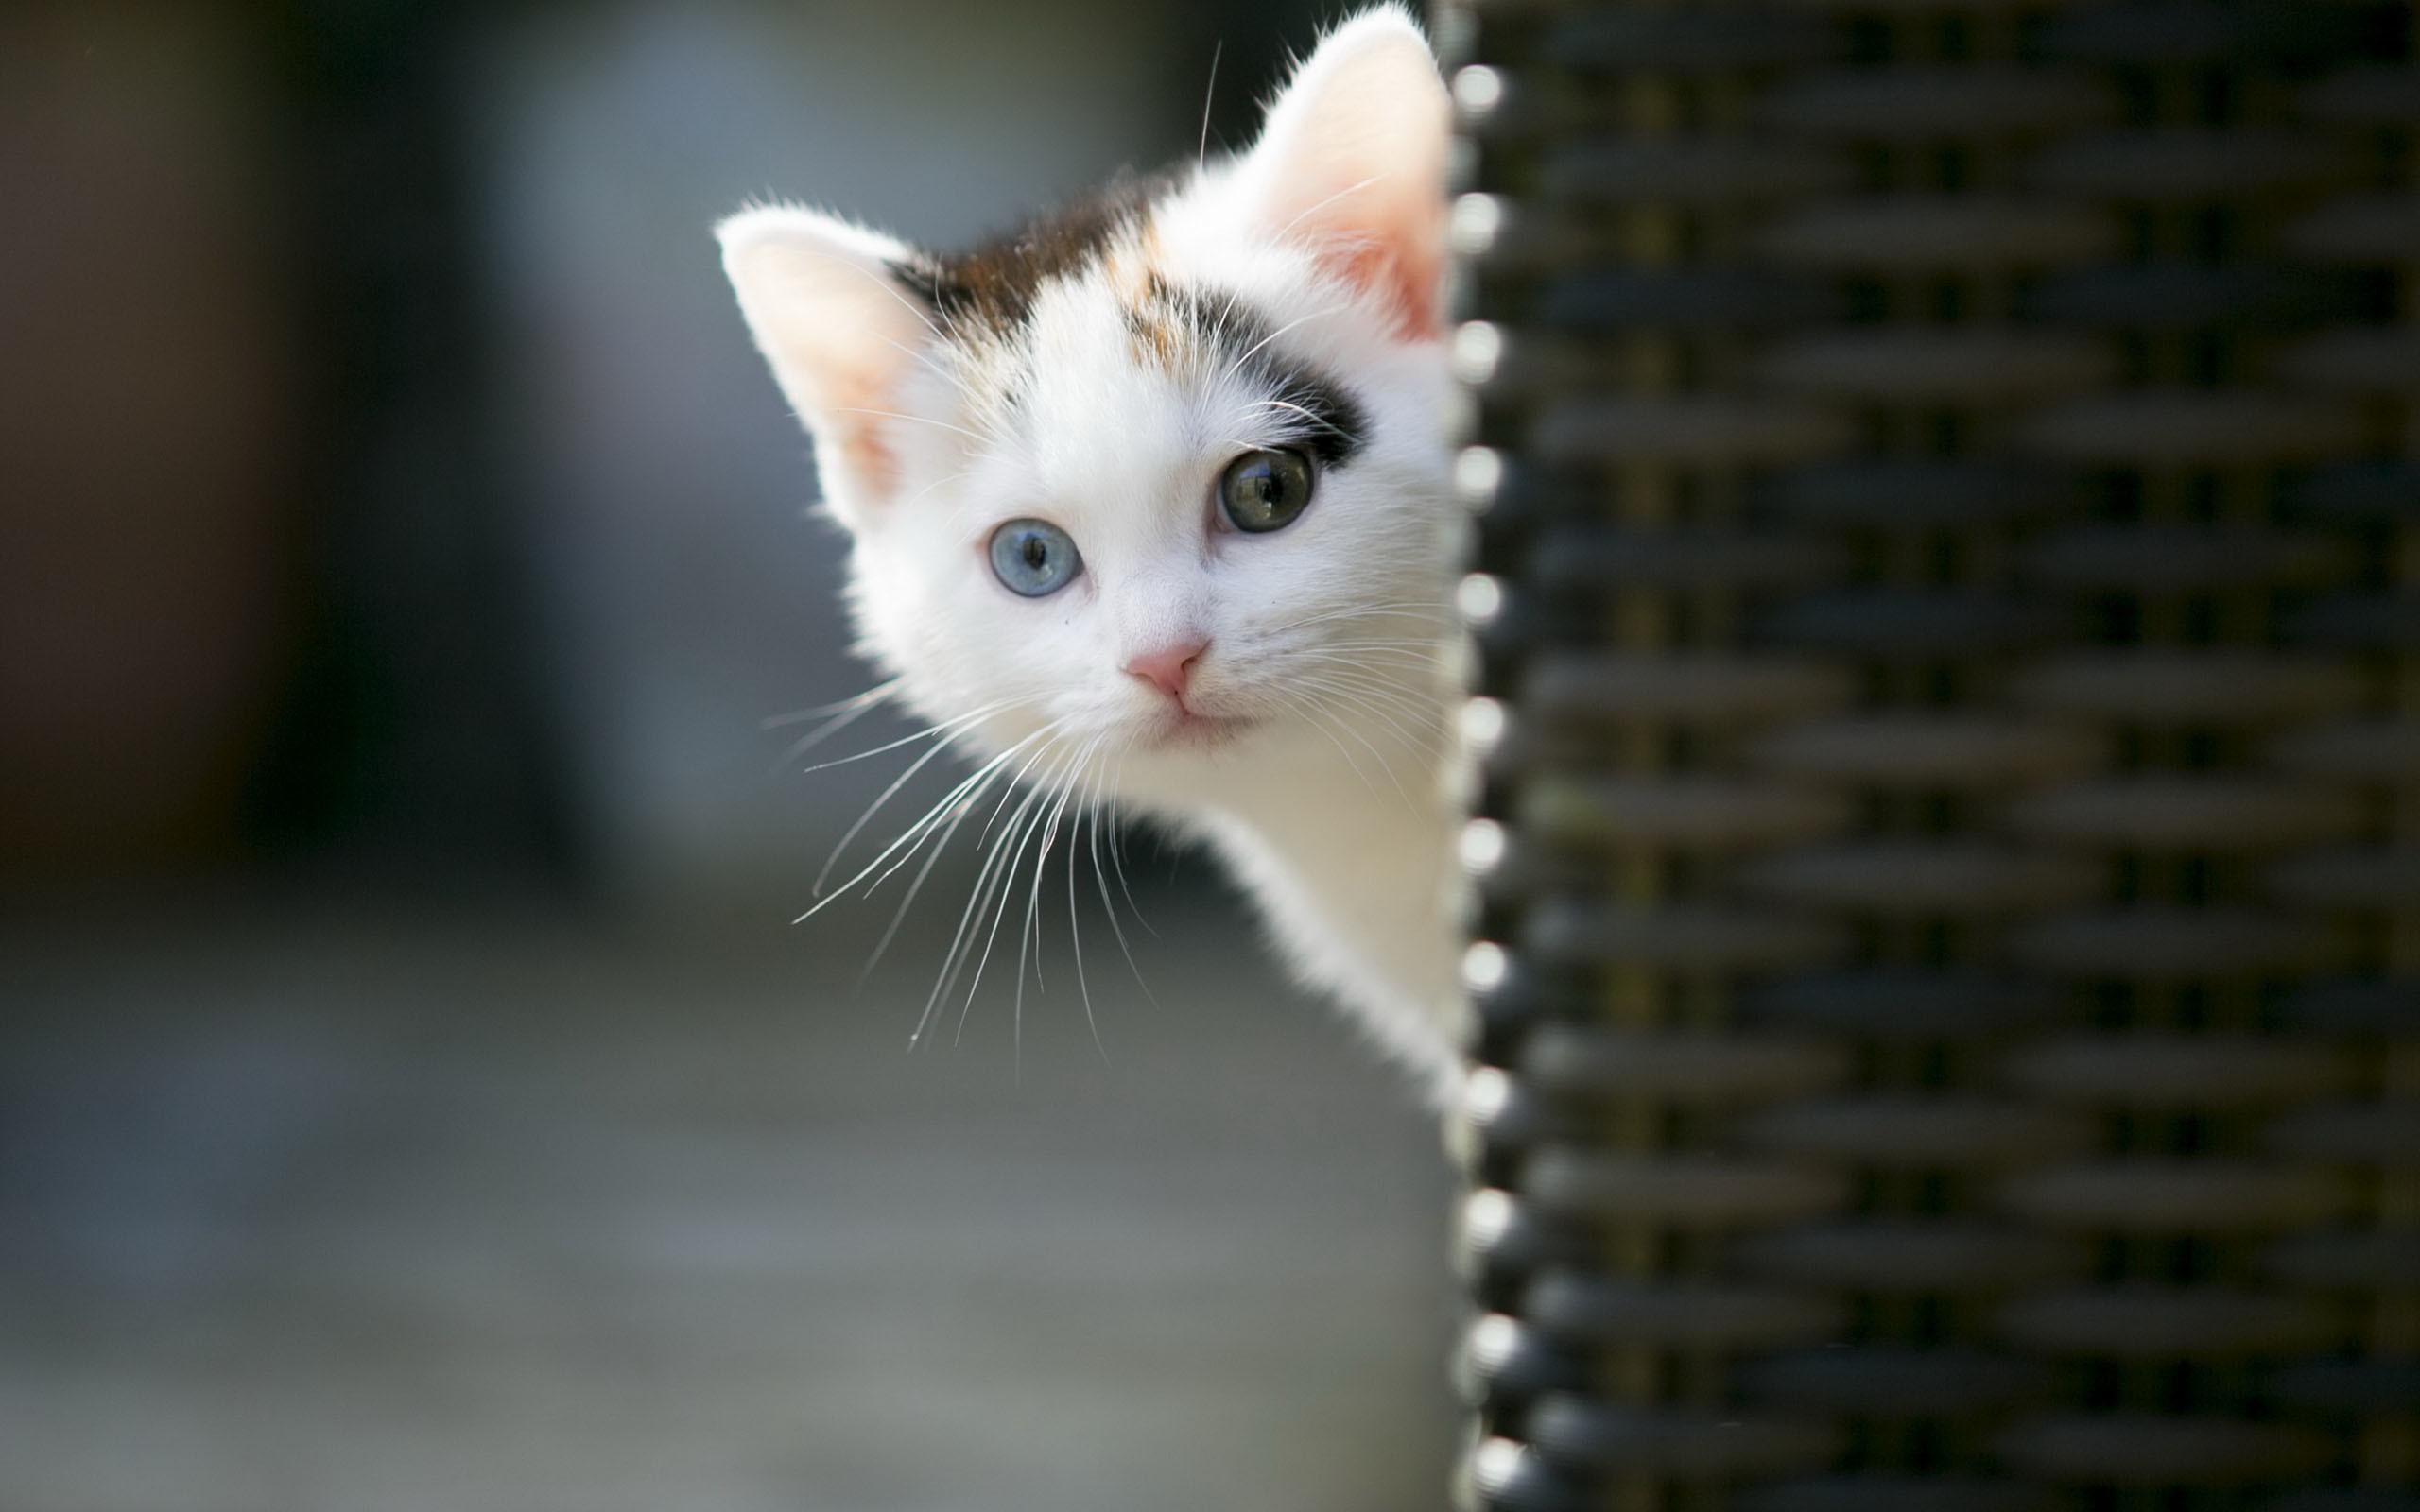 Animals Wallpaper: Cute Cat Wallpapers Images for HD Wallpaper Desktop